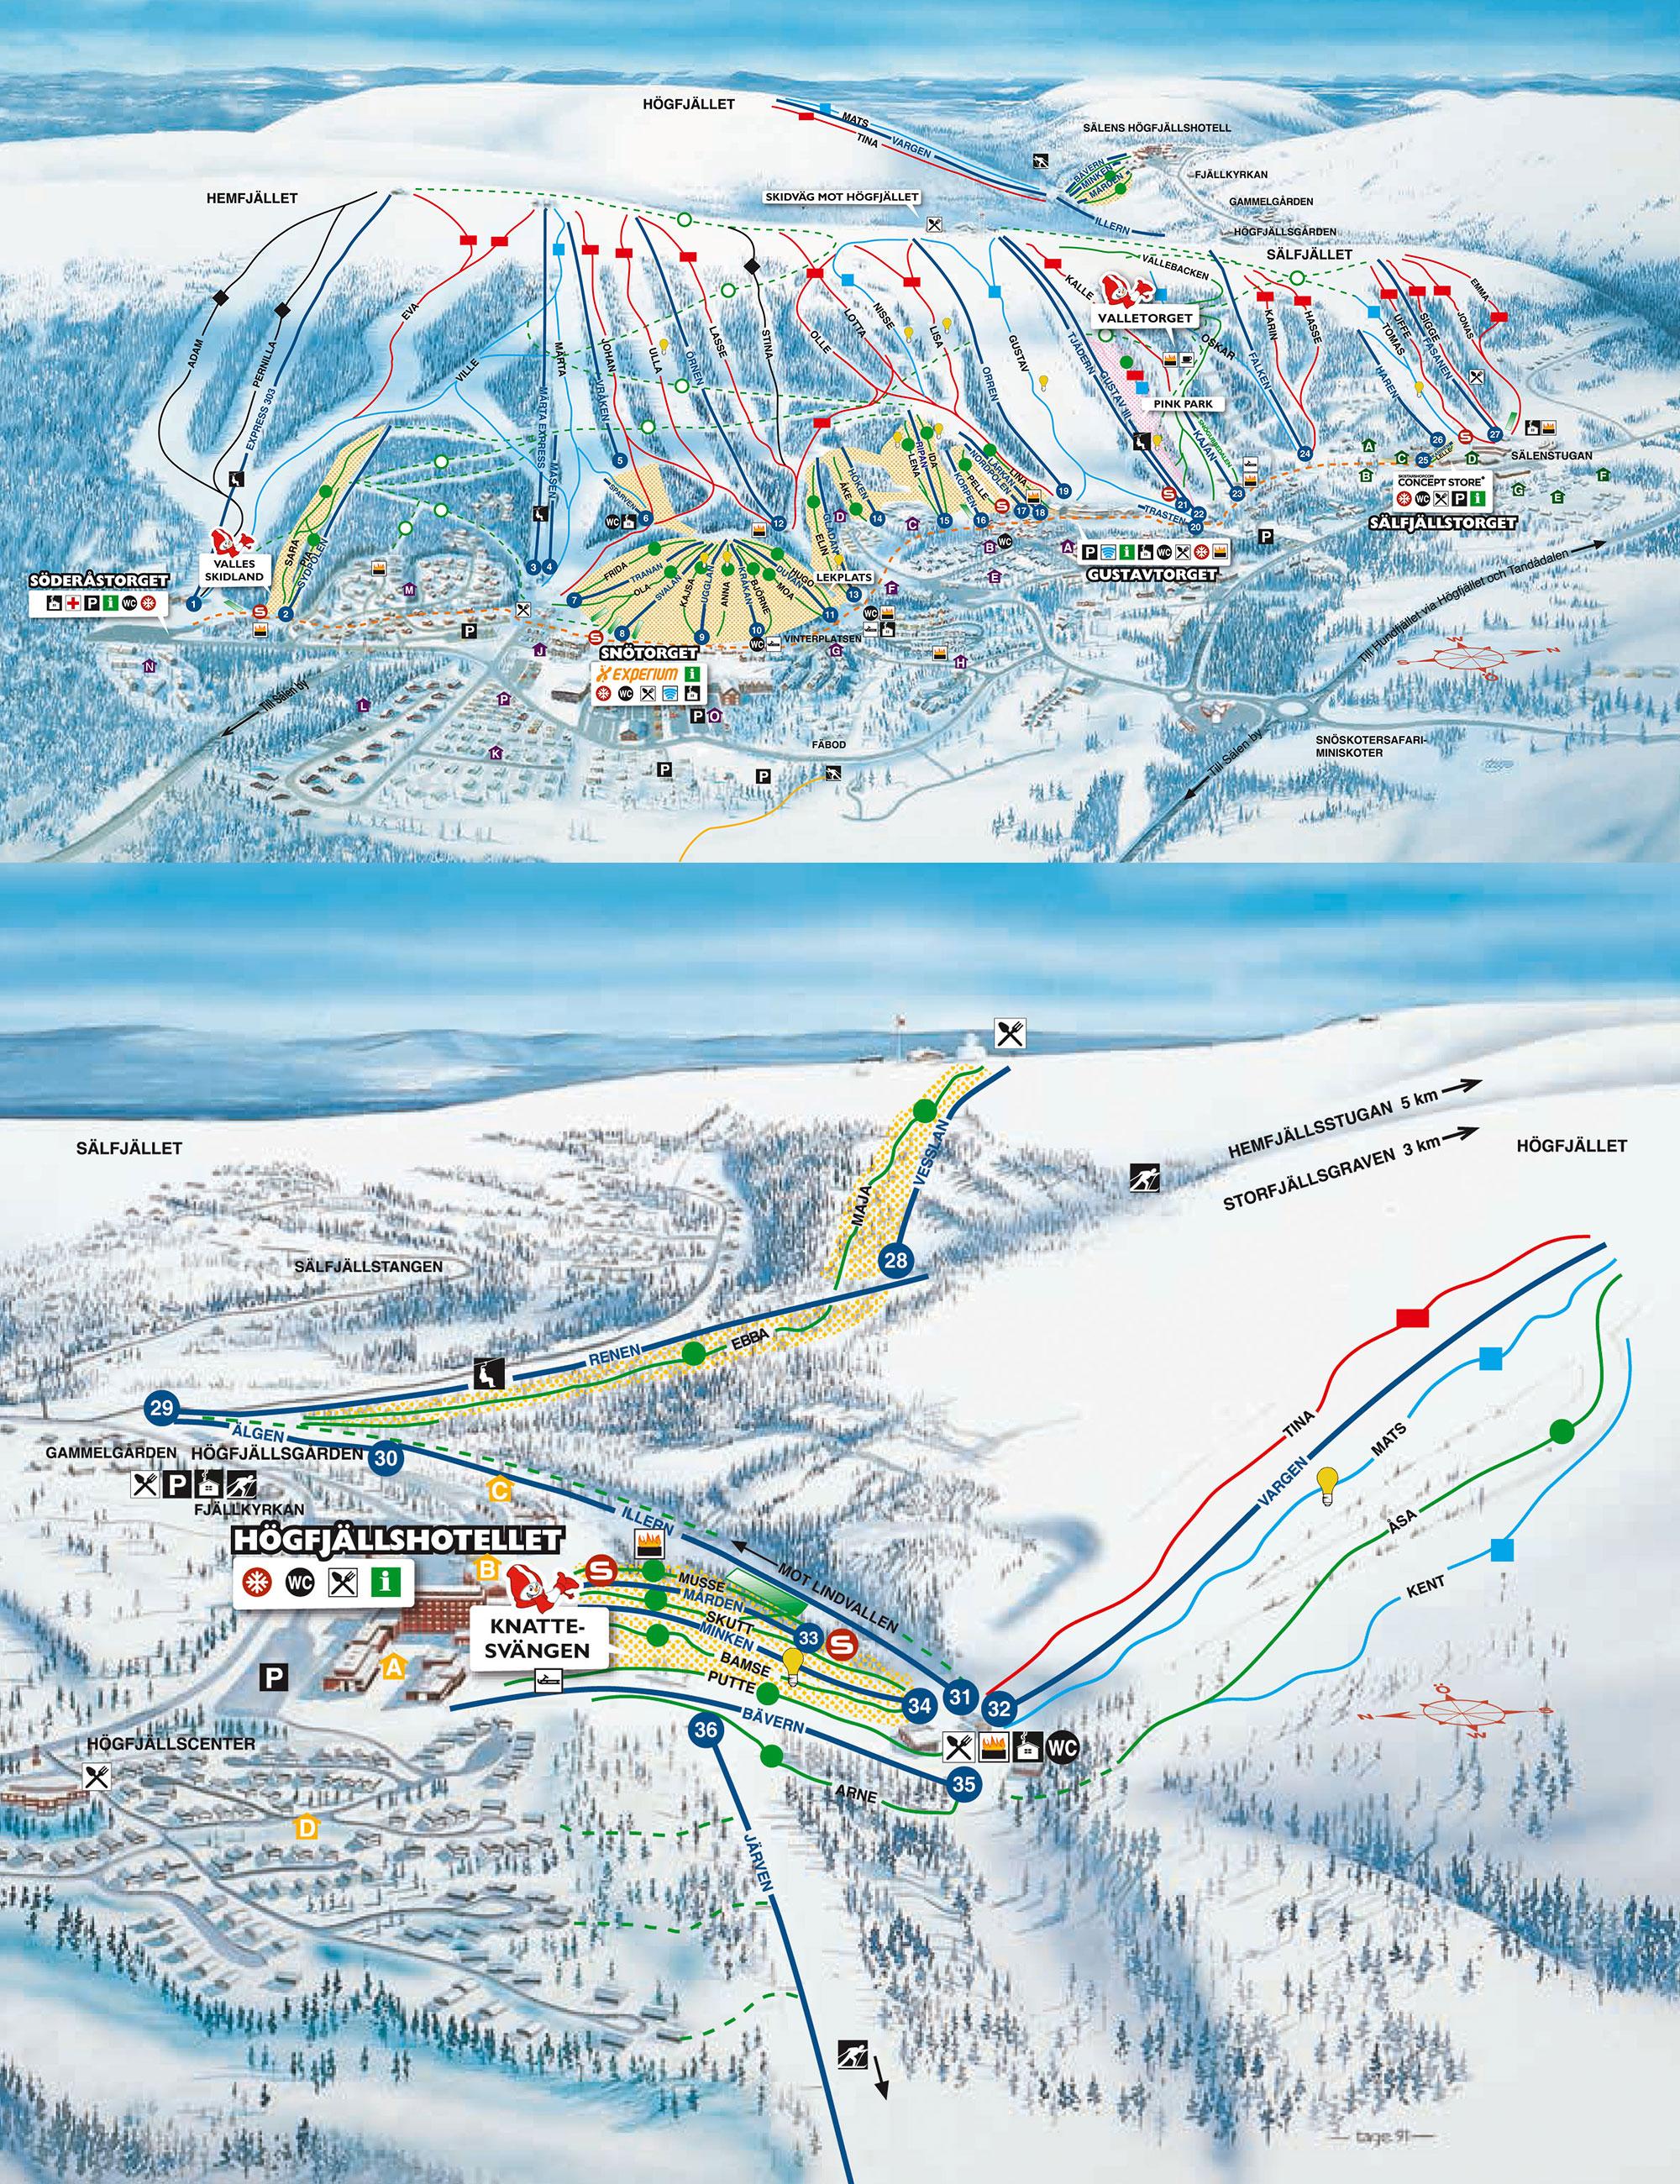 karta lindvallen gustavtorget Lindvallen   Högfjället | Skidinfo.se – Skidresor, nyheter om  karta lindvallen gustavtorget